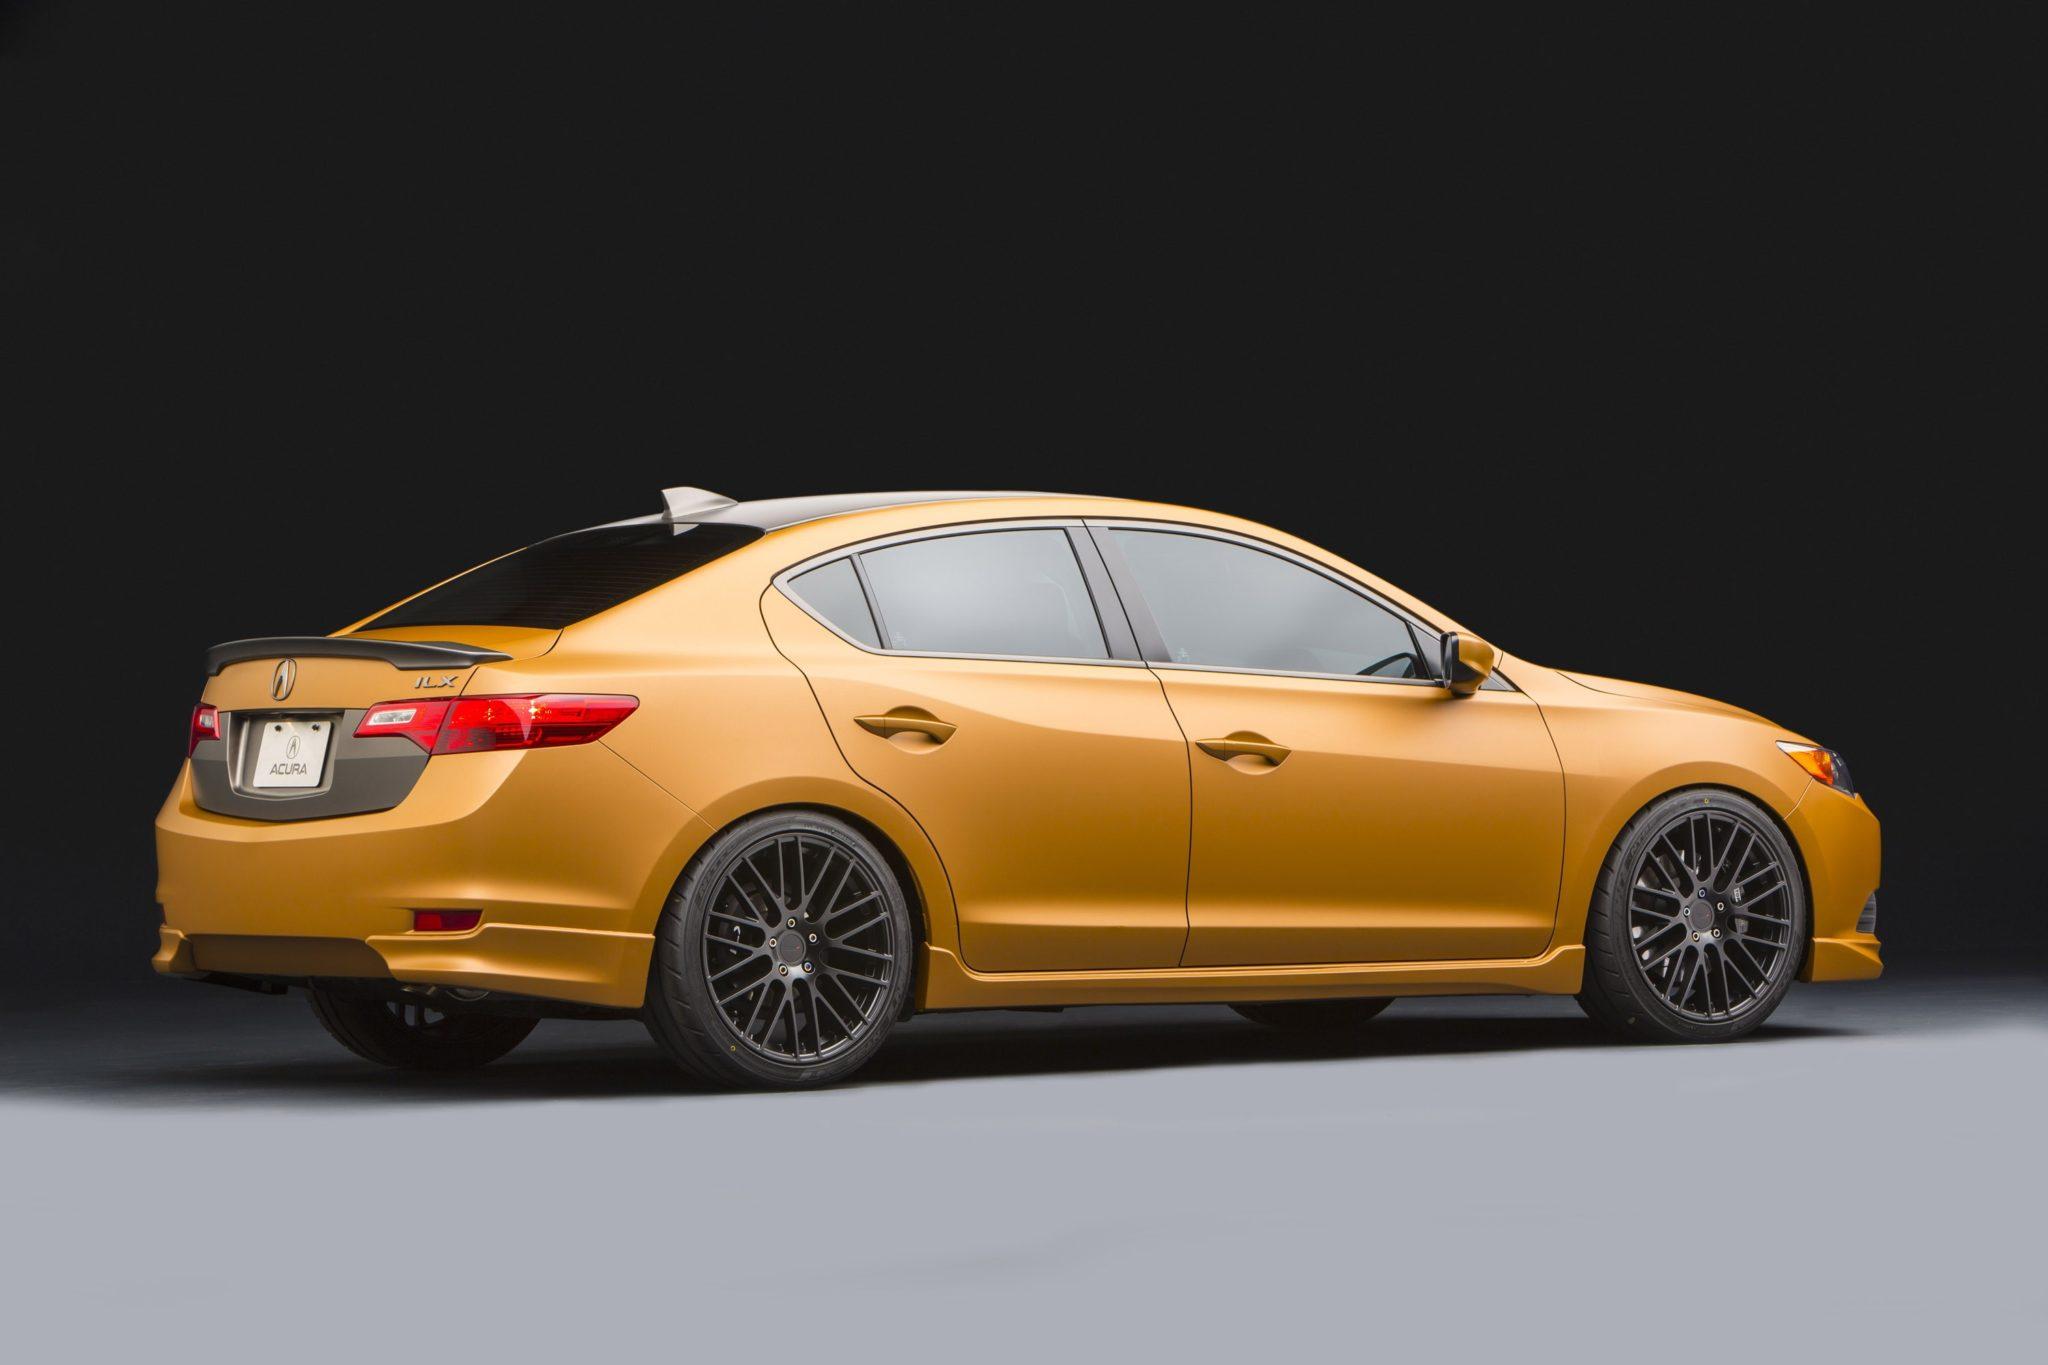 2014 Acura-Street Performance ILX